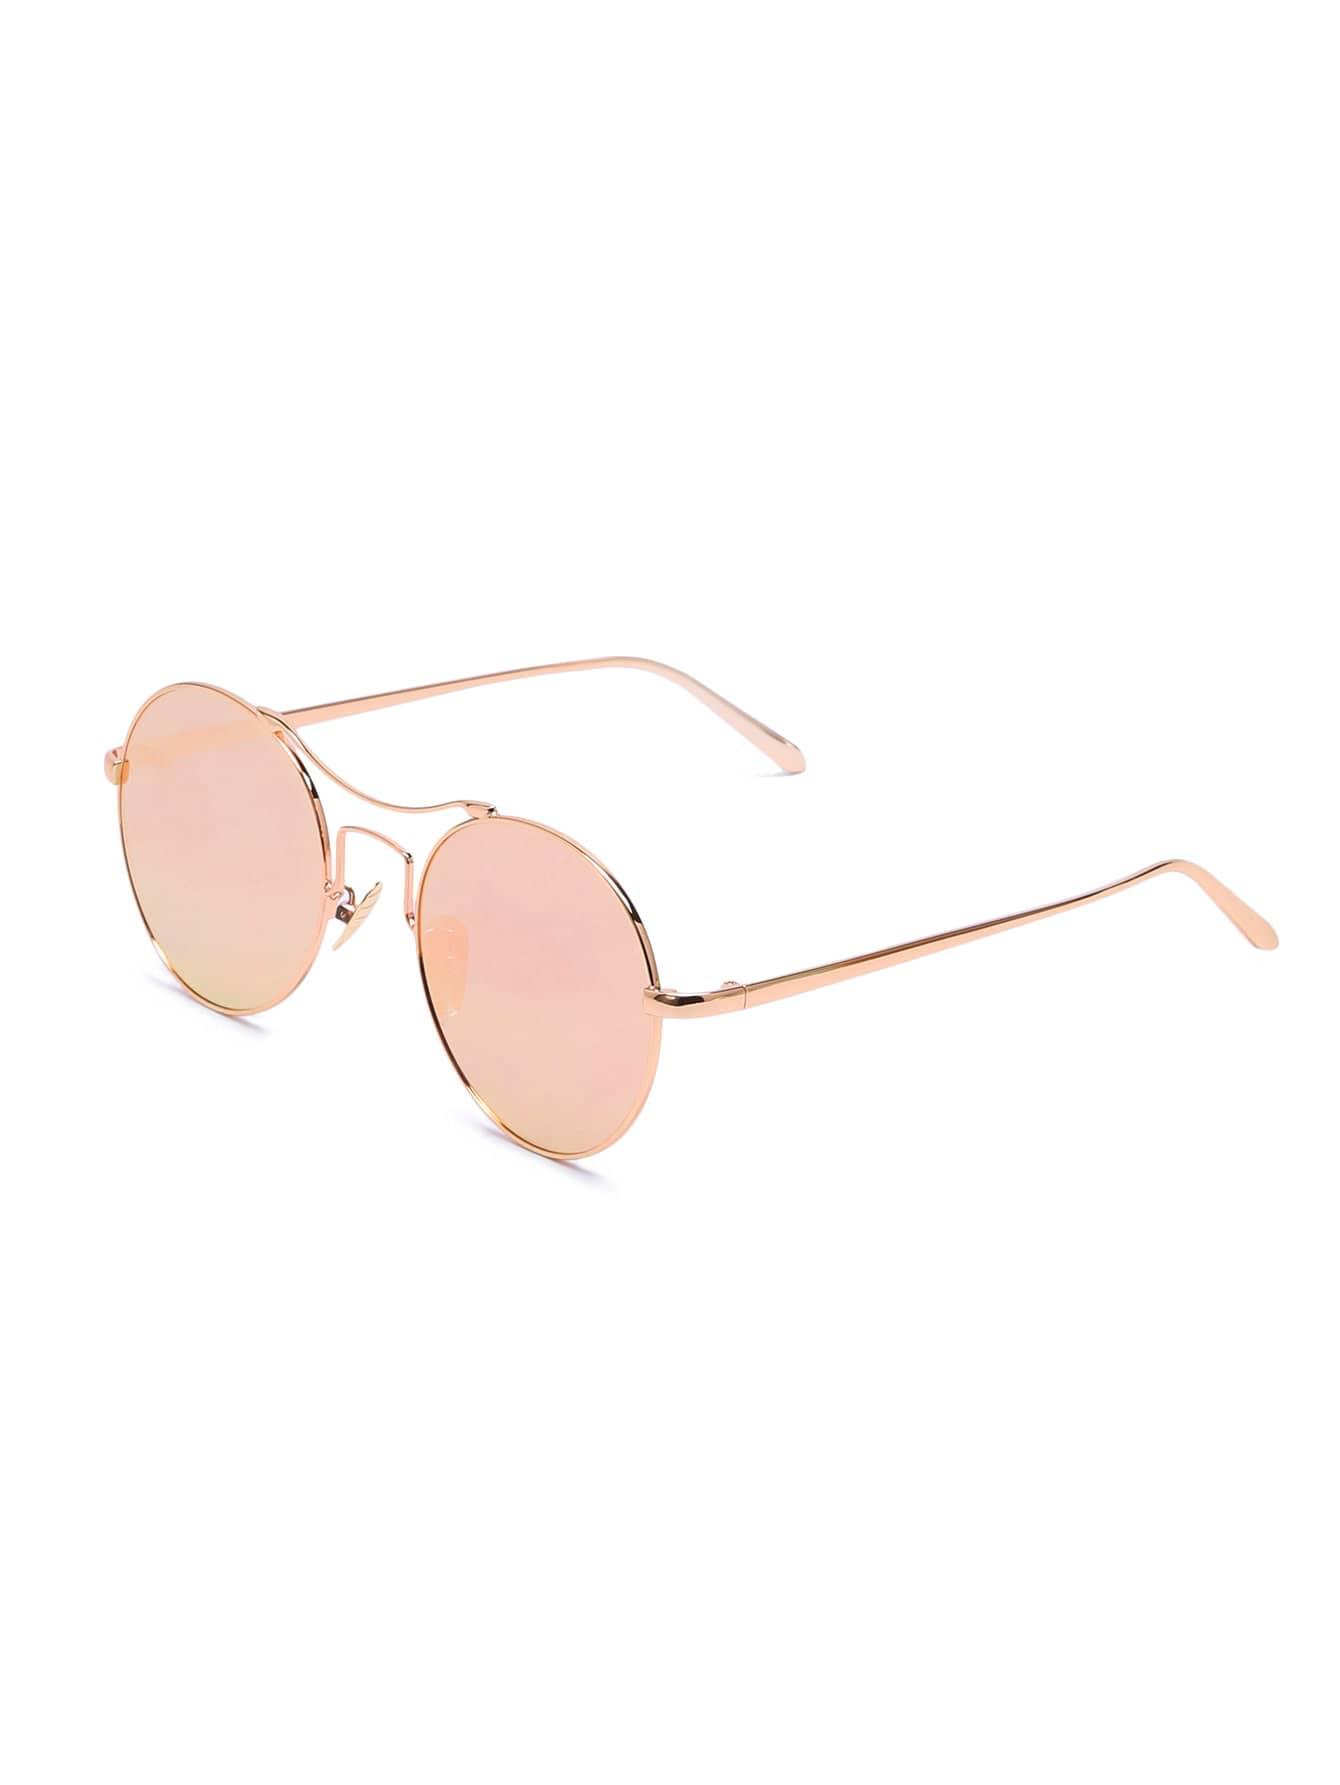 Metal Frame Double Bridge Pink Lens SunglassesMetal Frame Double Bridge Pink Lens Sunglasses<br><br>color: Pink<br>size: None